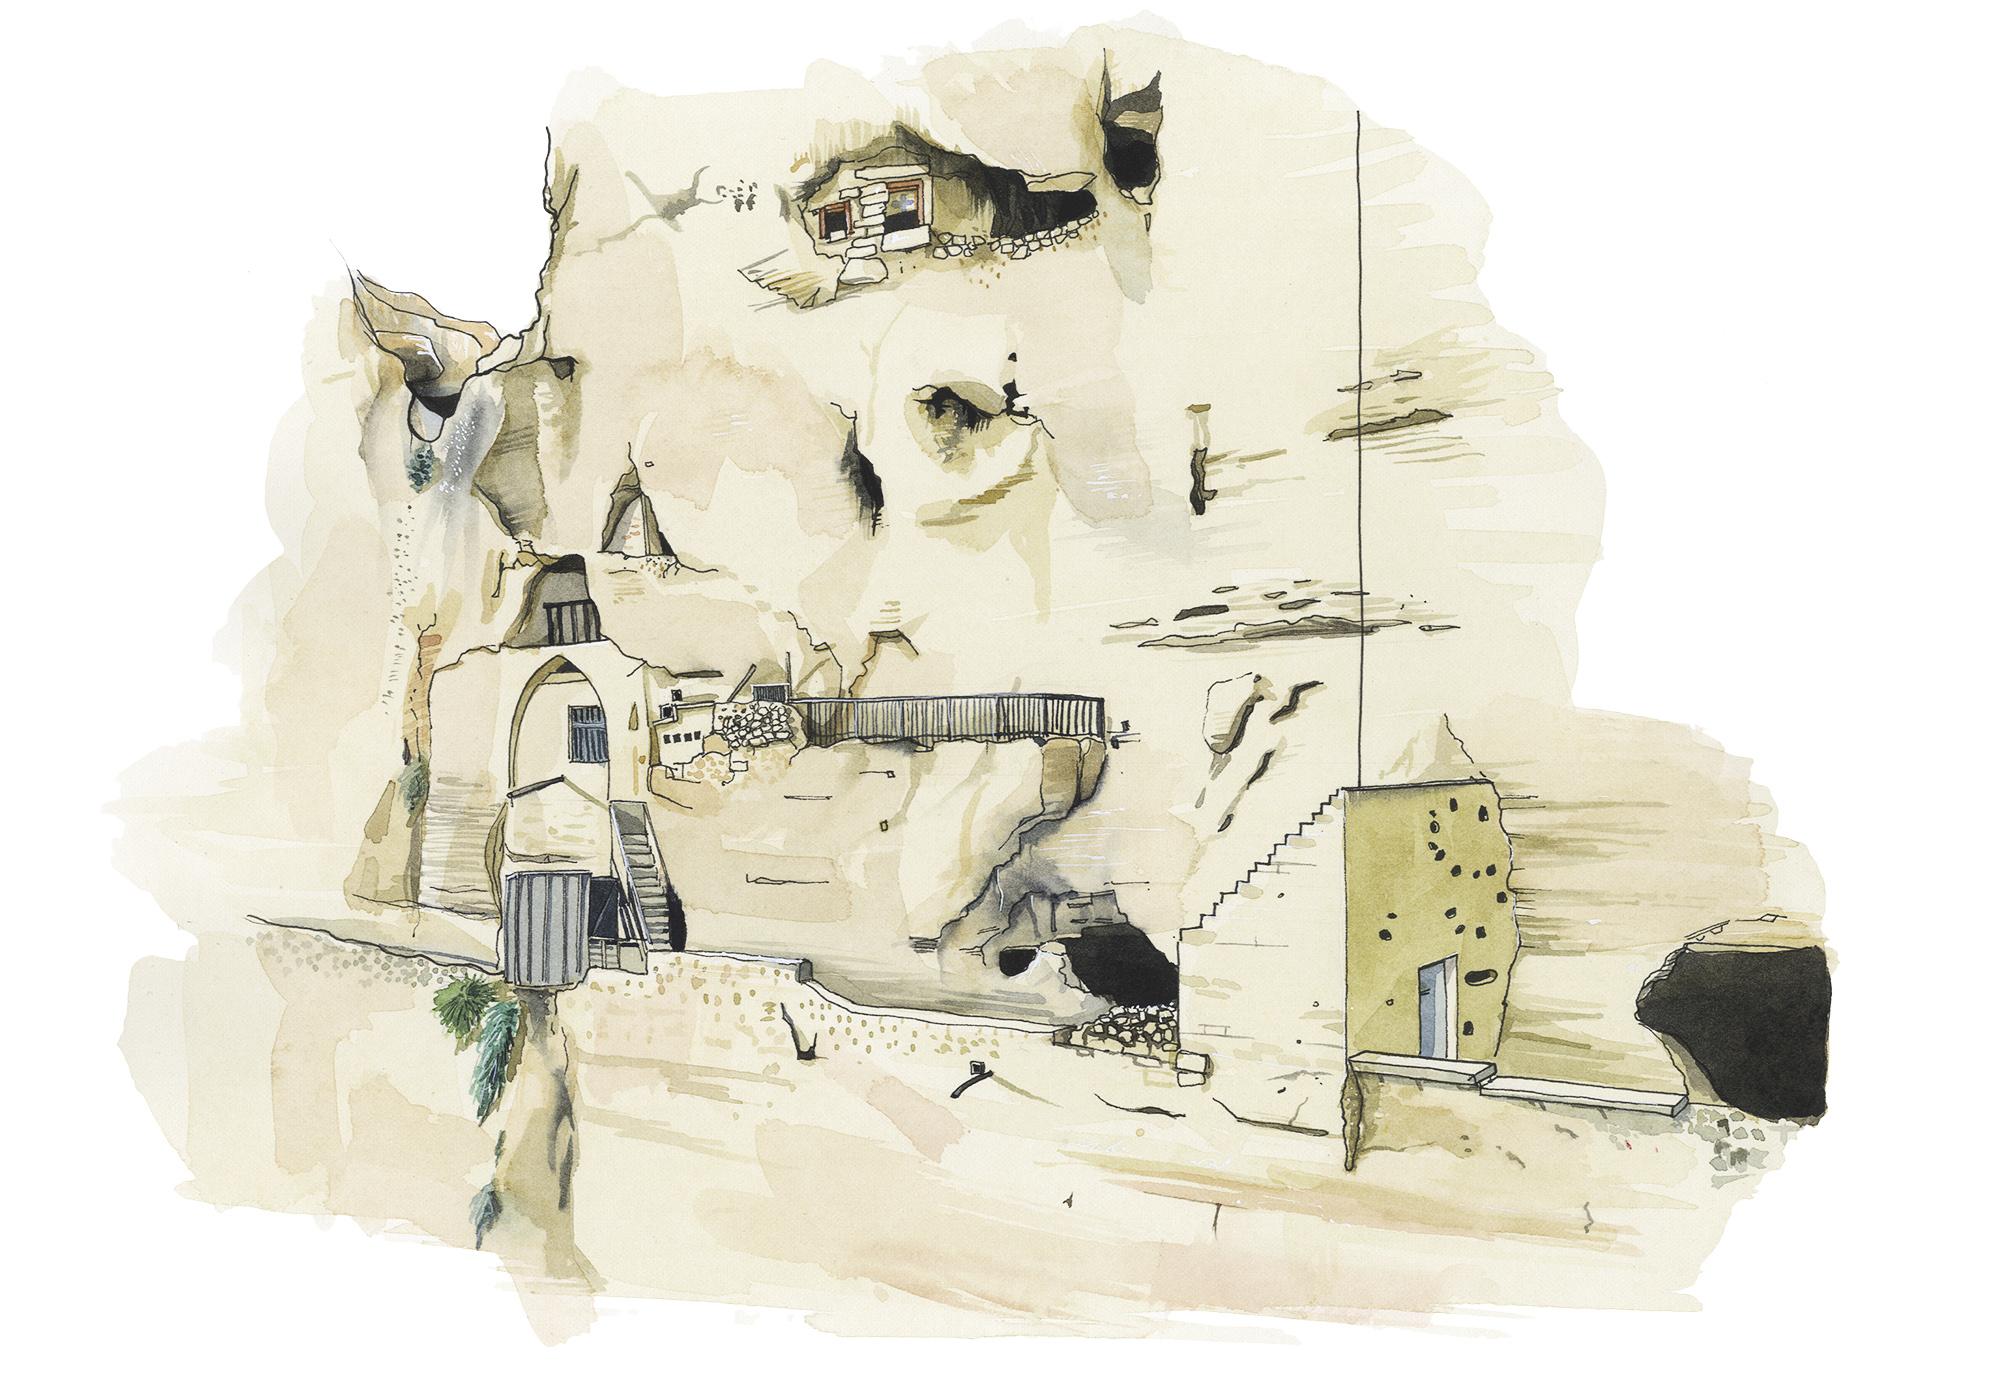 Hermit Cells, Mount of Temptation, Jericho.